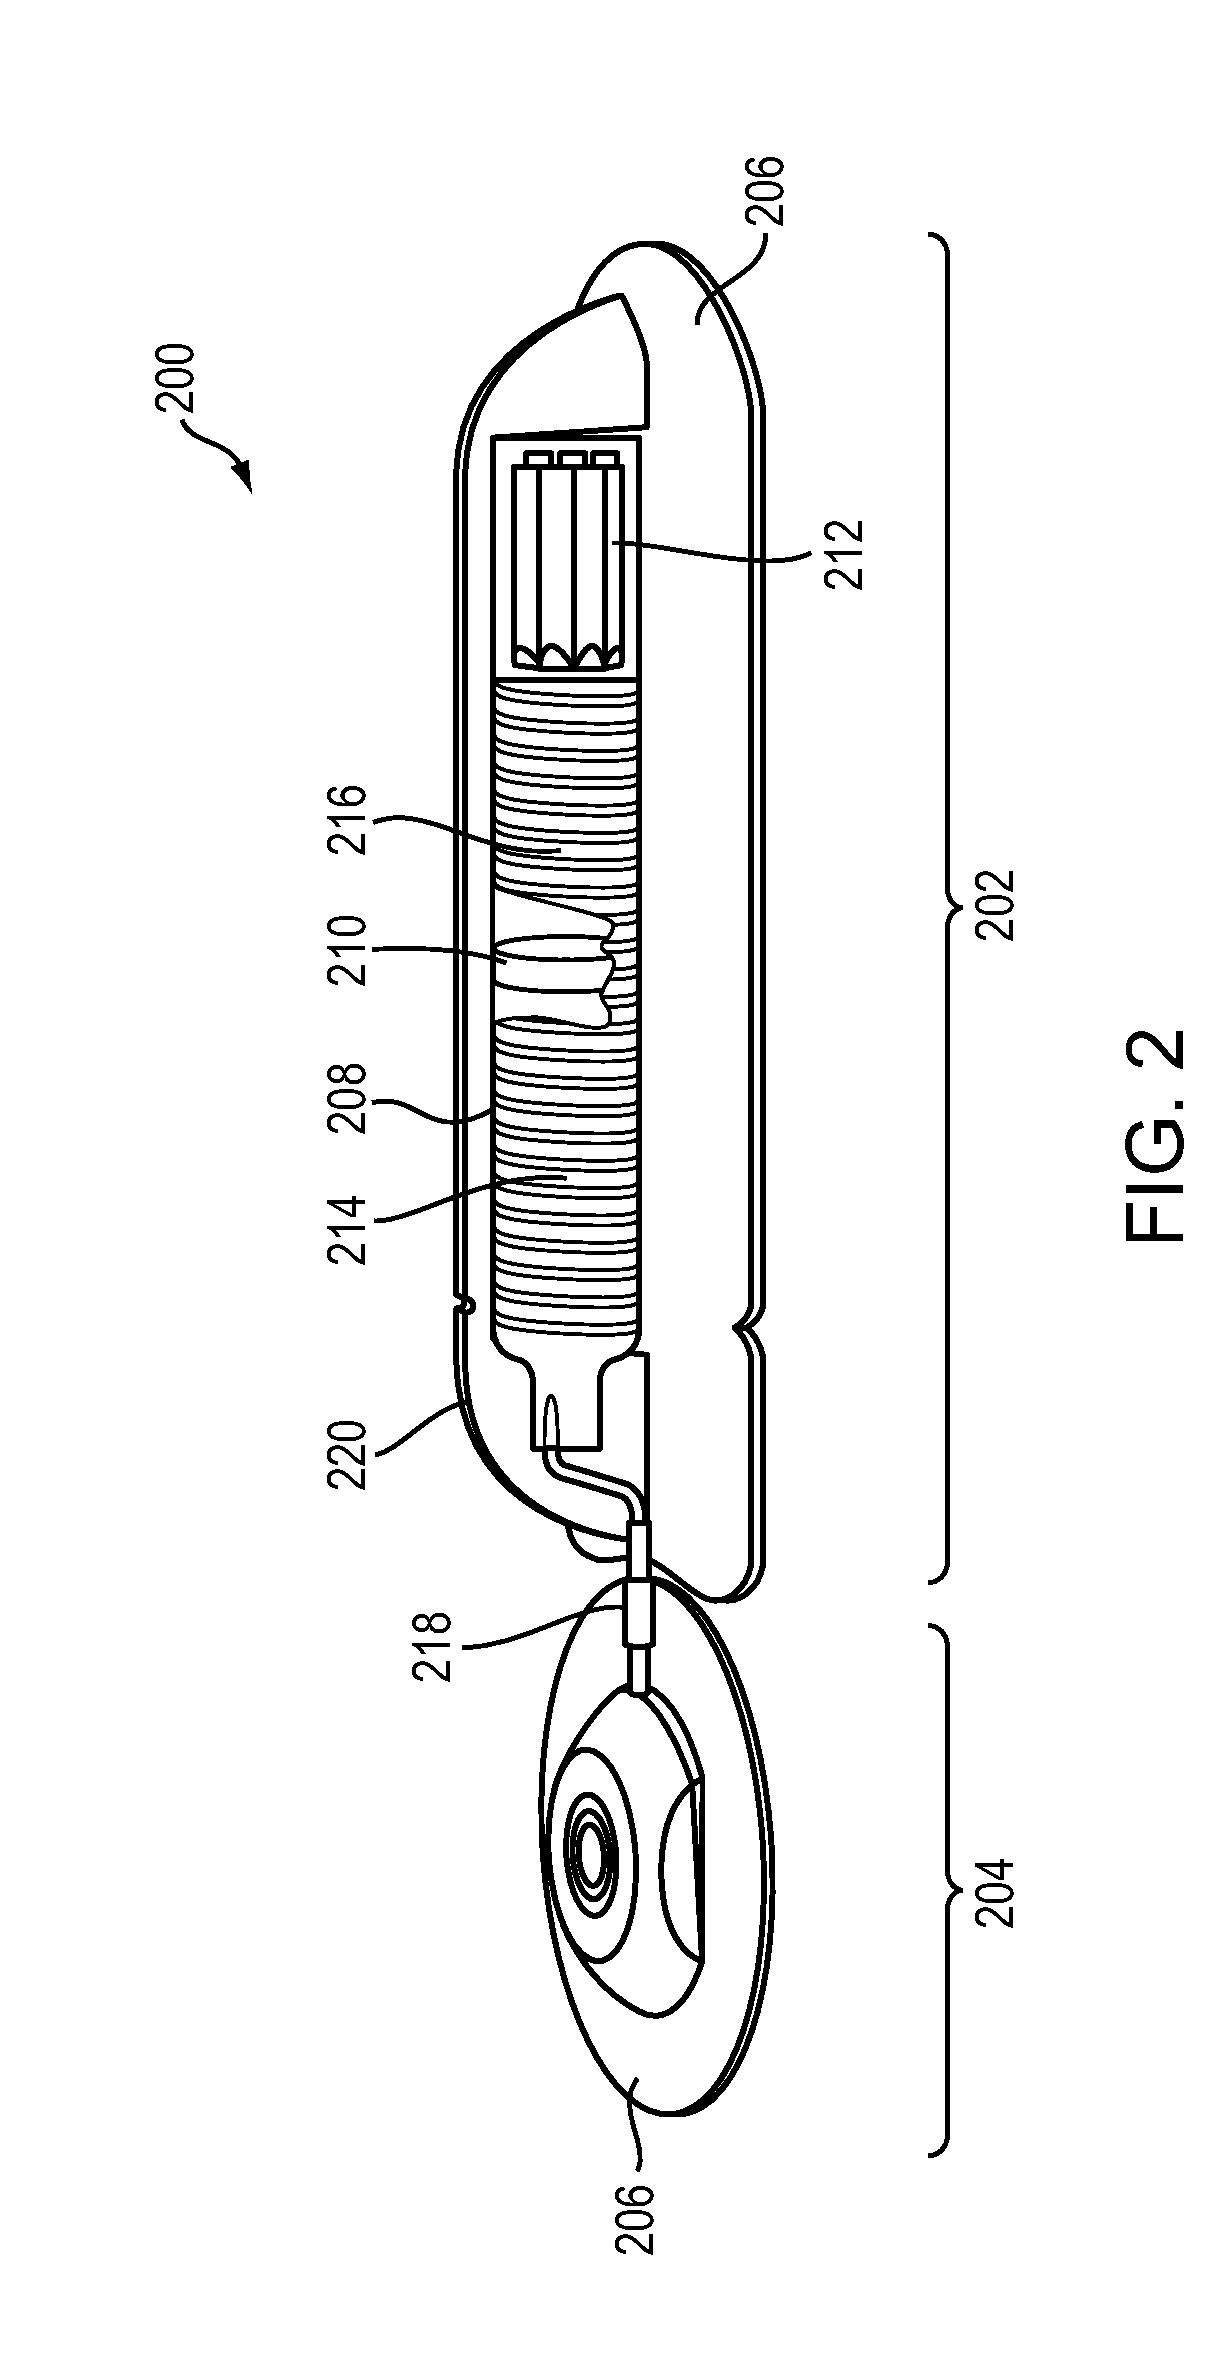 patent us20110275987 piston driven drug pump devices google patents. Black Bedroom Furniture Sets. Home Design Ideas